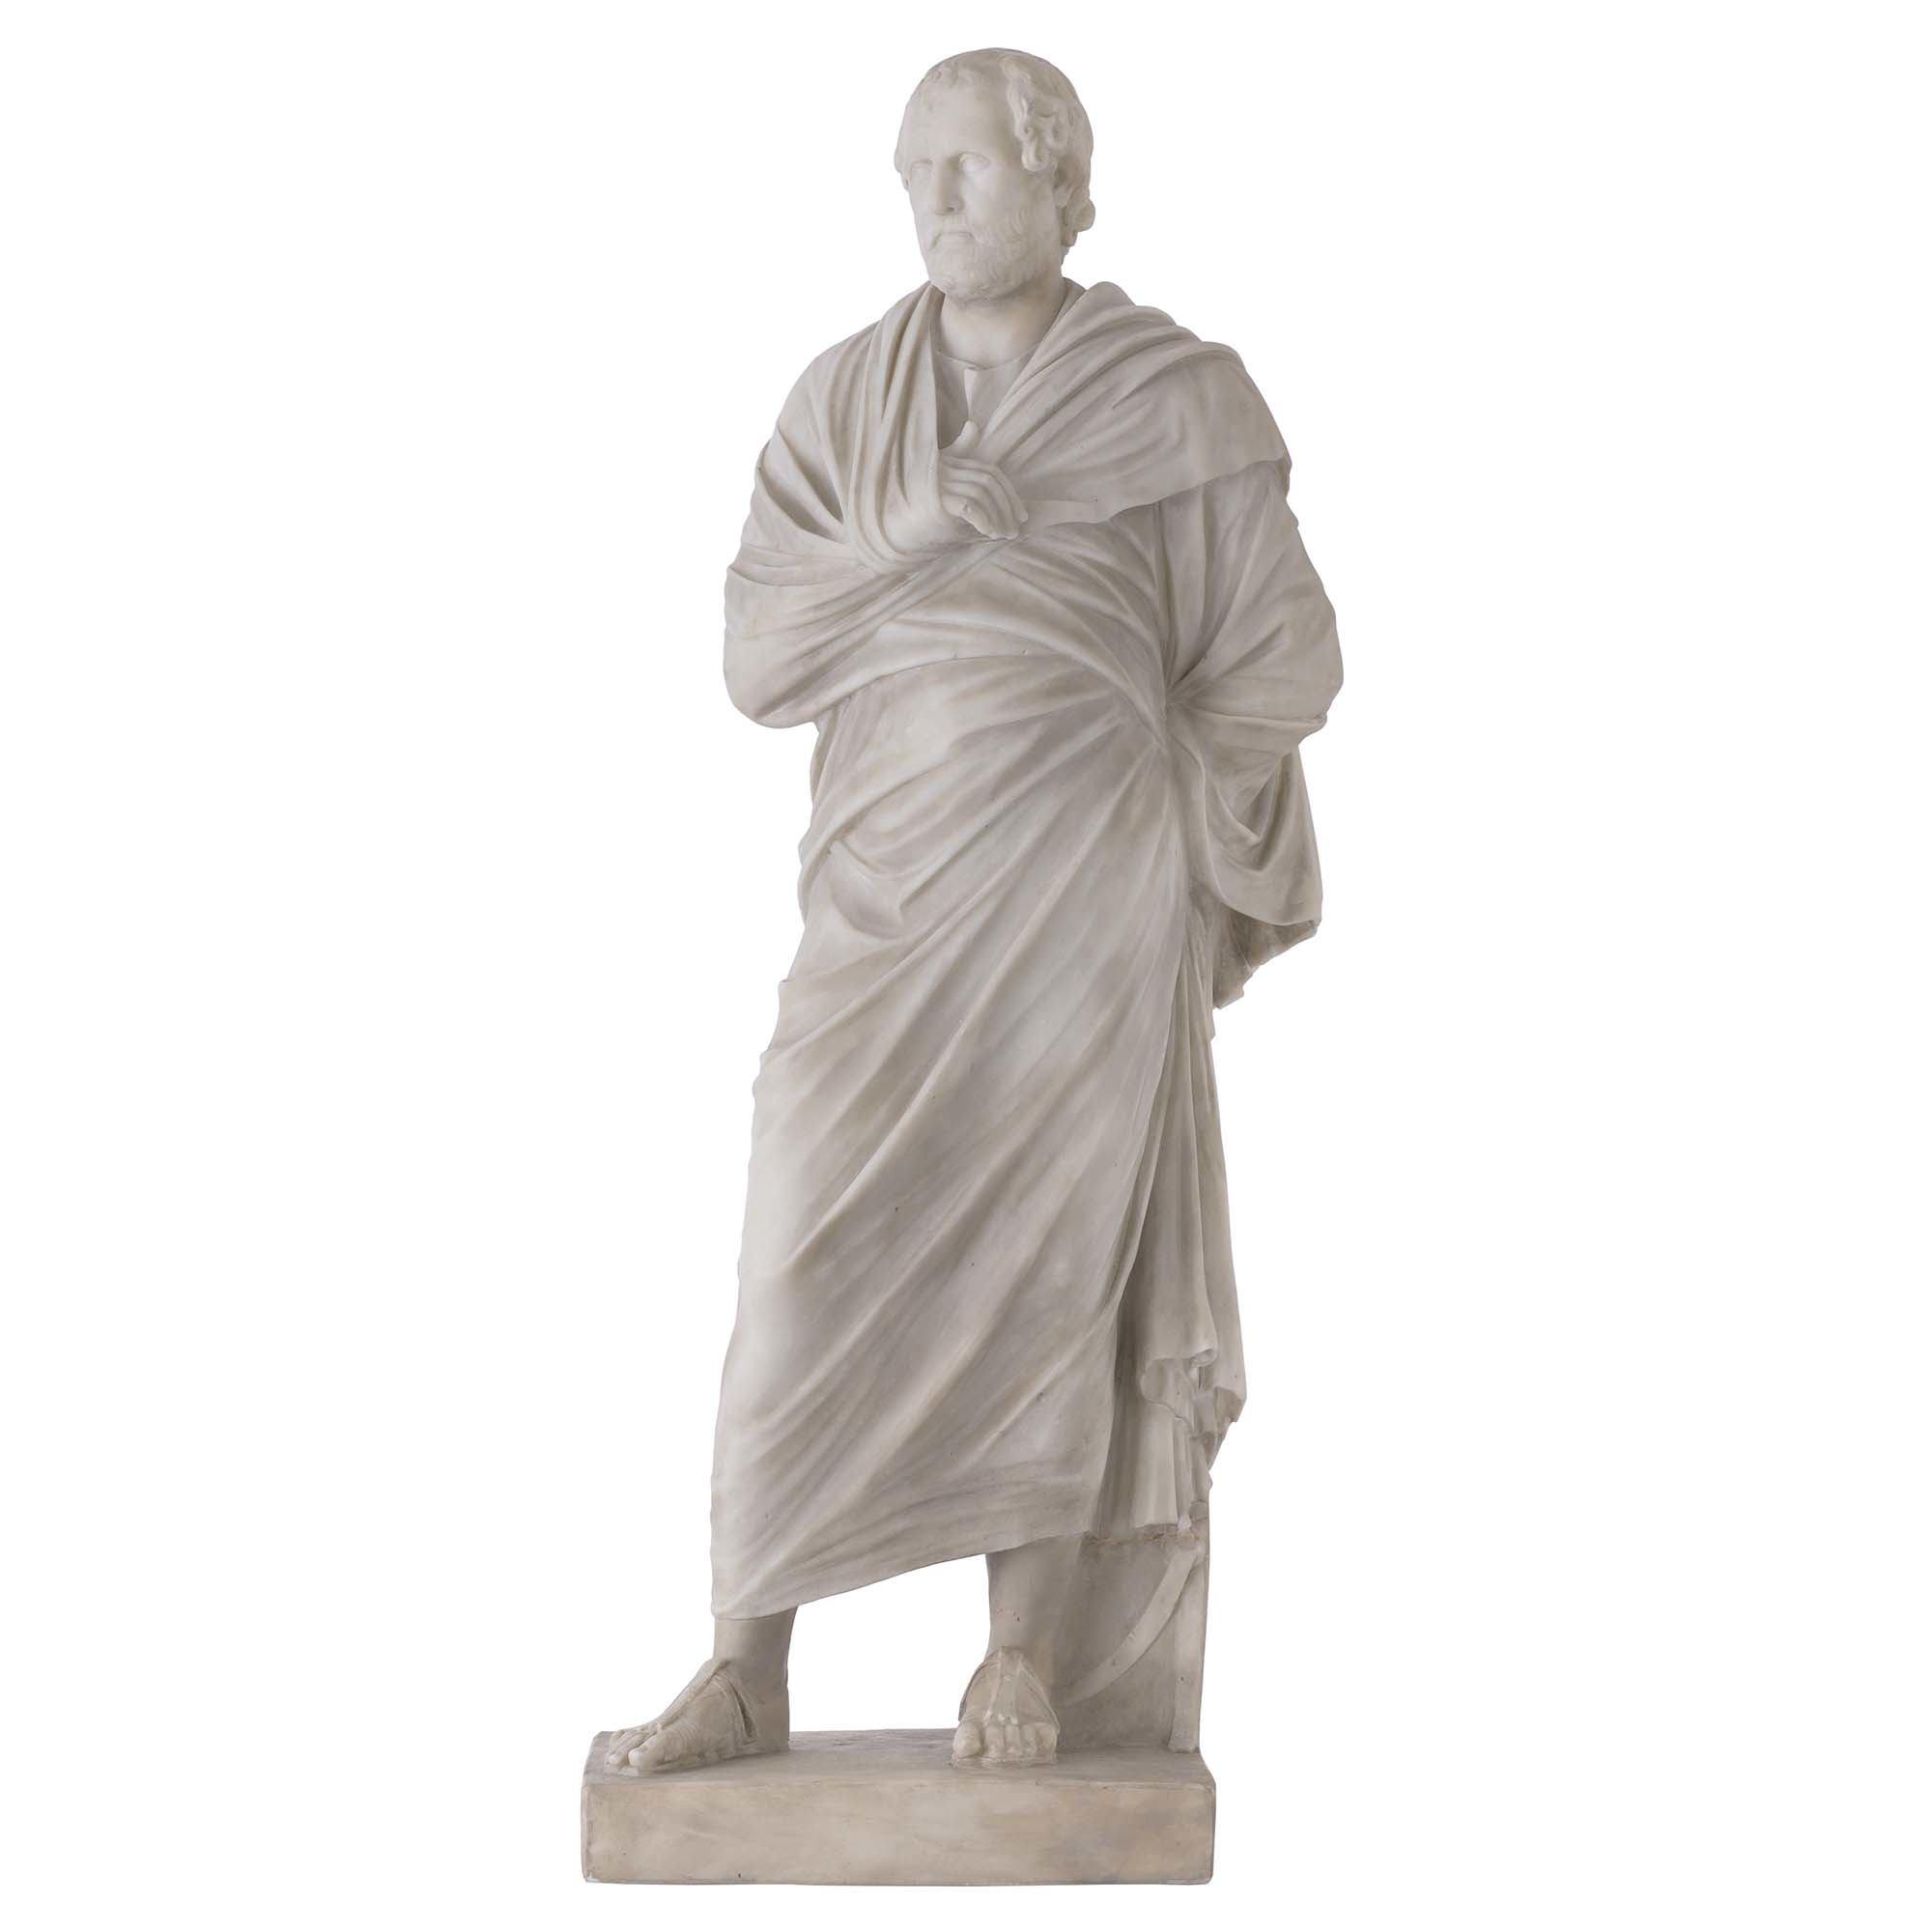 Italian 19th Century White Carrara Marble Statue Of Aeschines Of The Ten Attic Orators Cedric